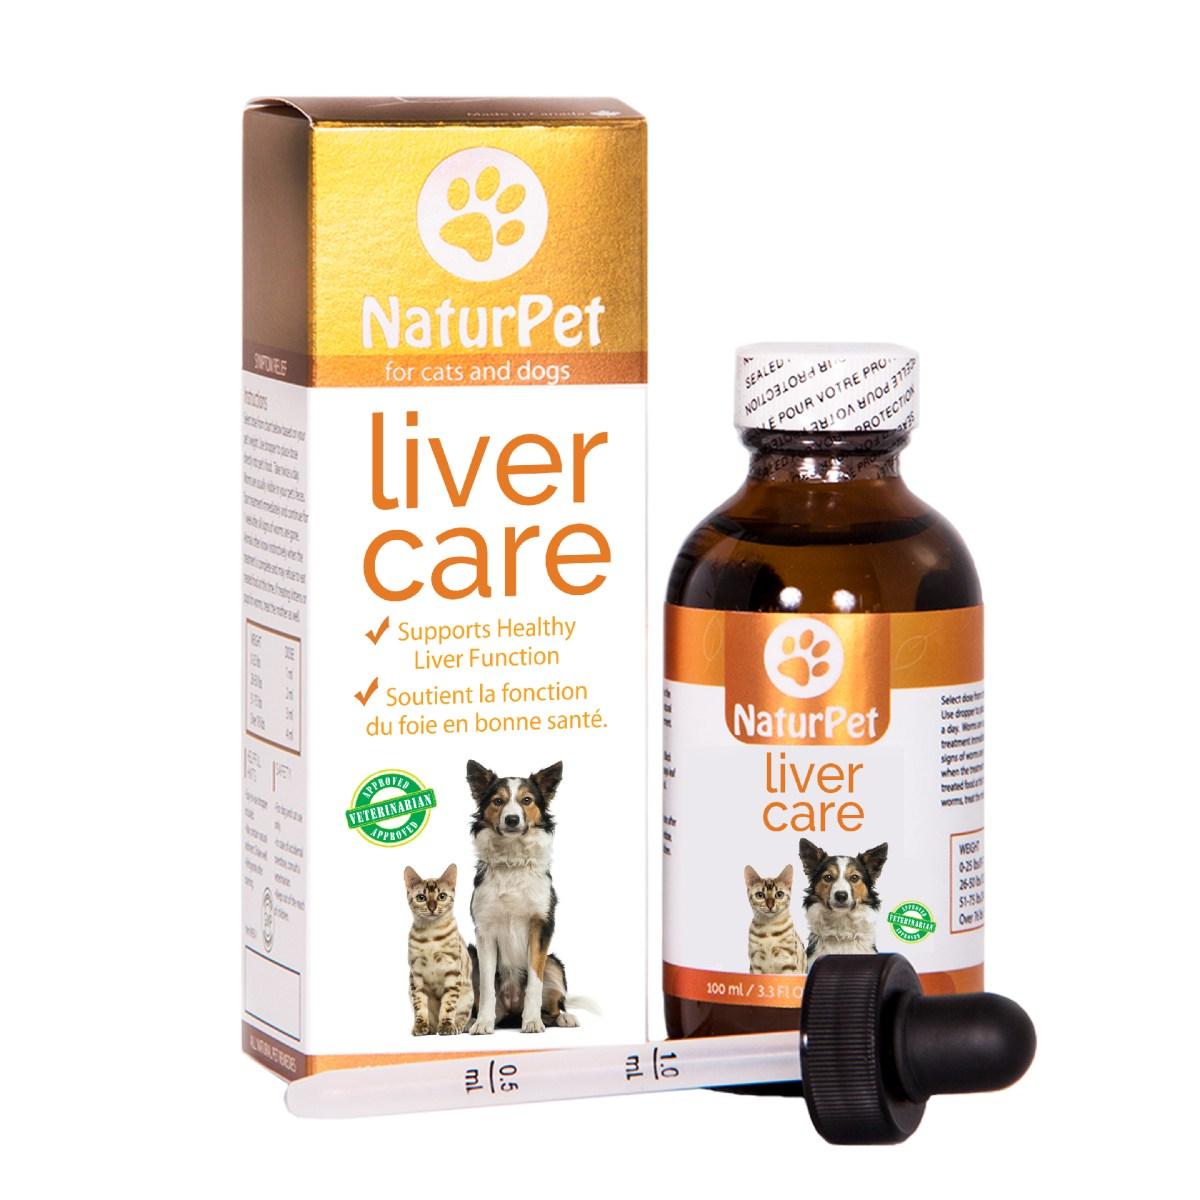 NaurPet Liver Care, 補肝, 肝補健品